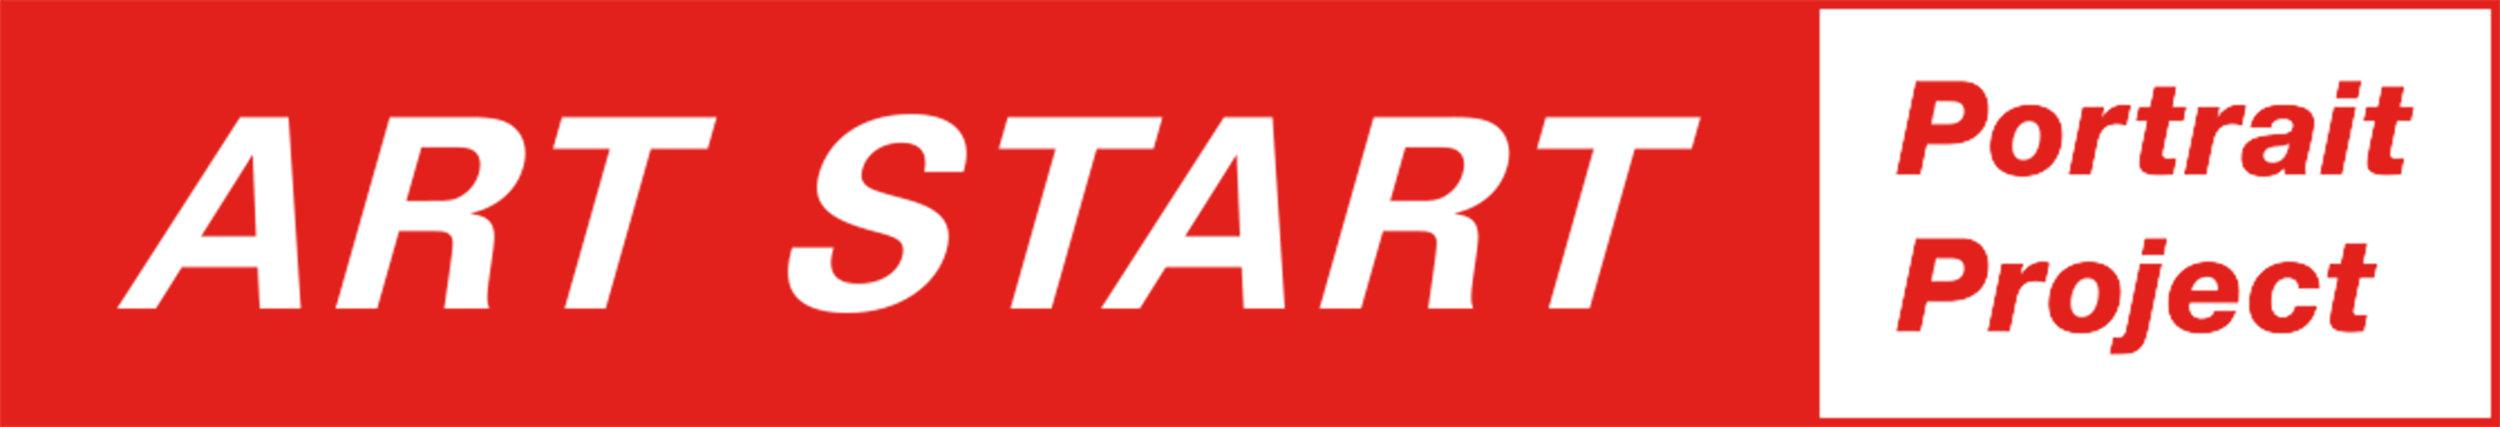 AAPP_logo.jpg